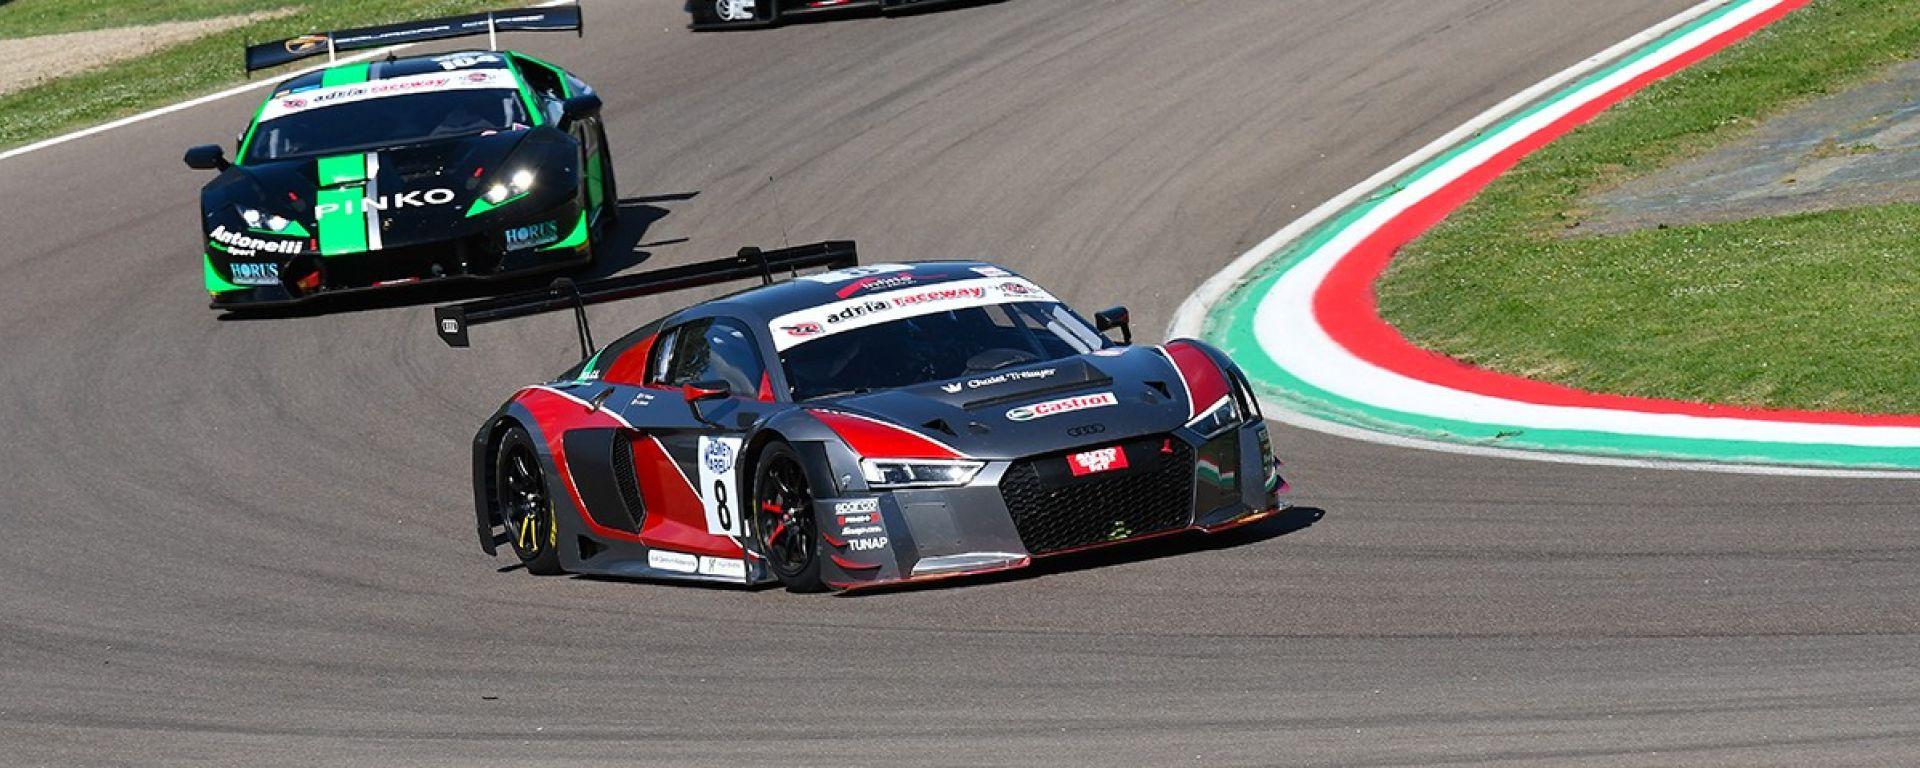 Benoît Tréluyer e la sua Audi R8 LMS